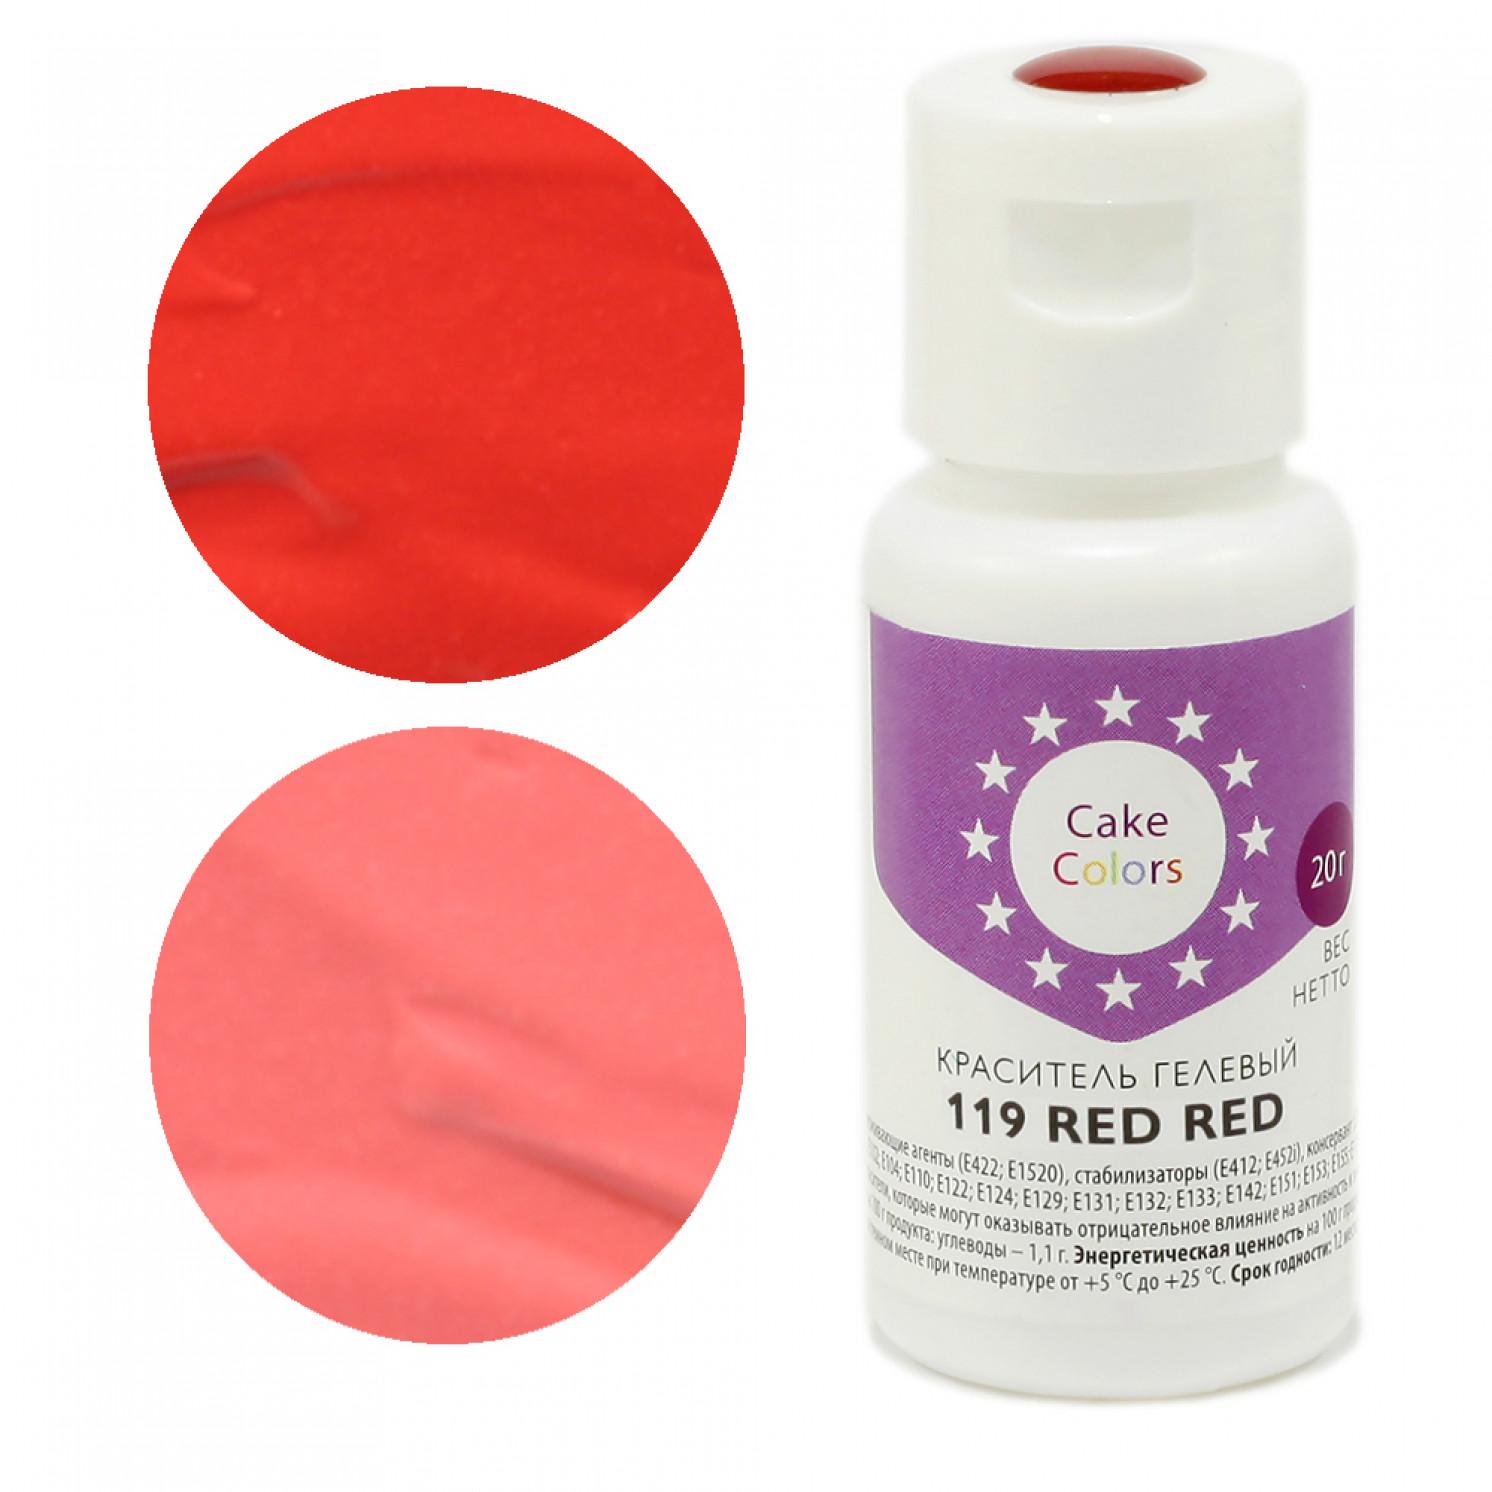 Краситель гелевый Cake Colors 119 RED RED, 20г